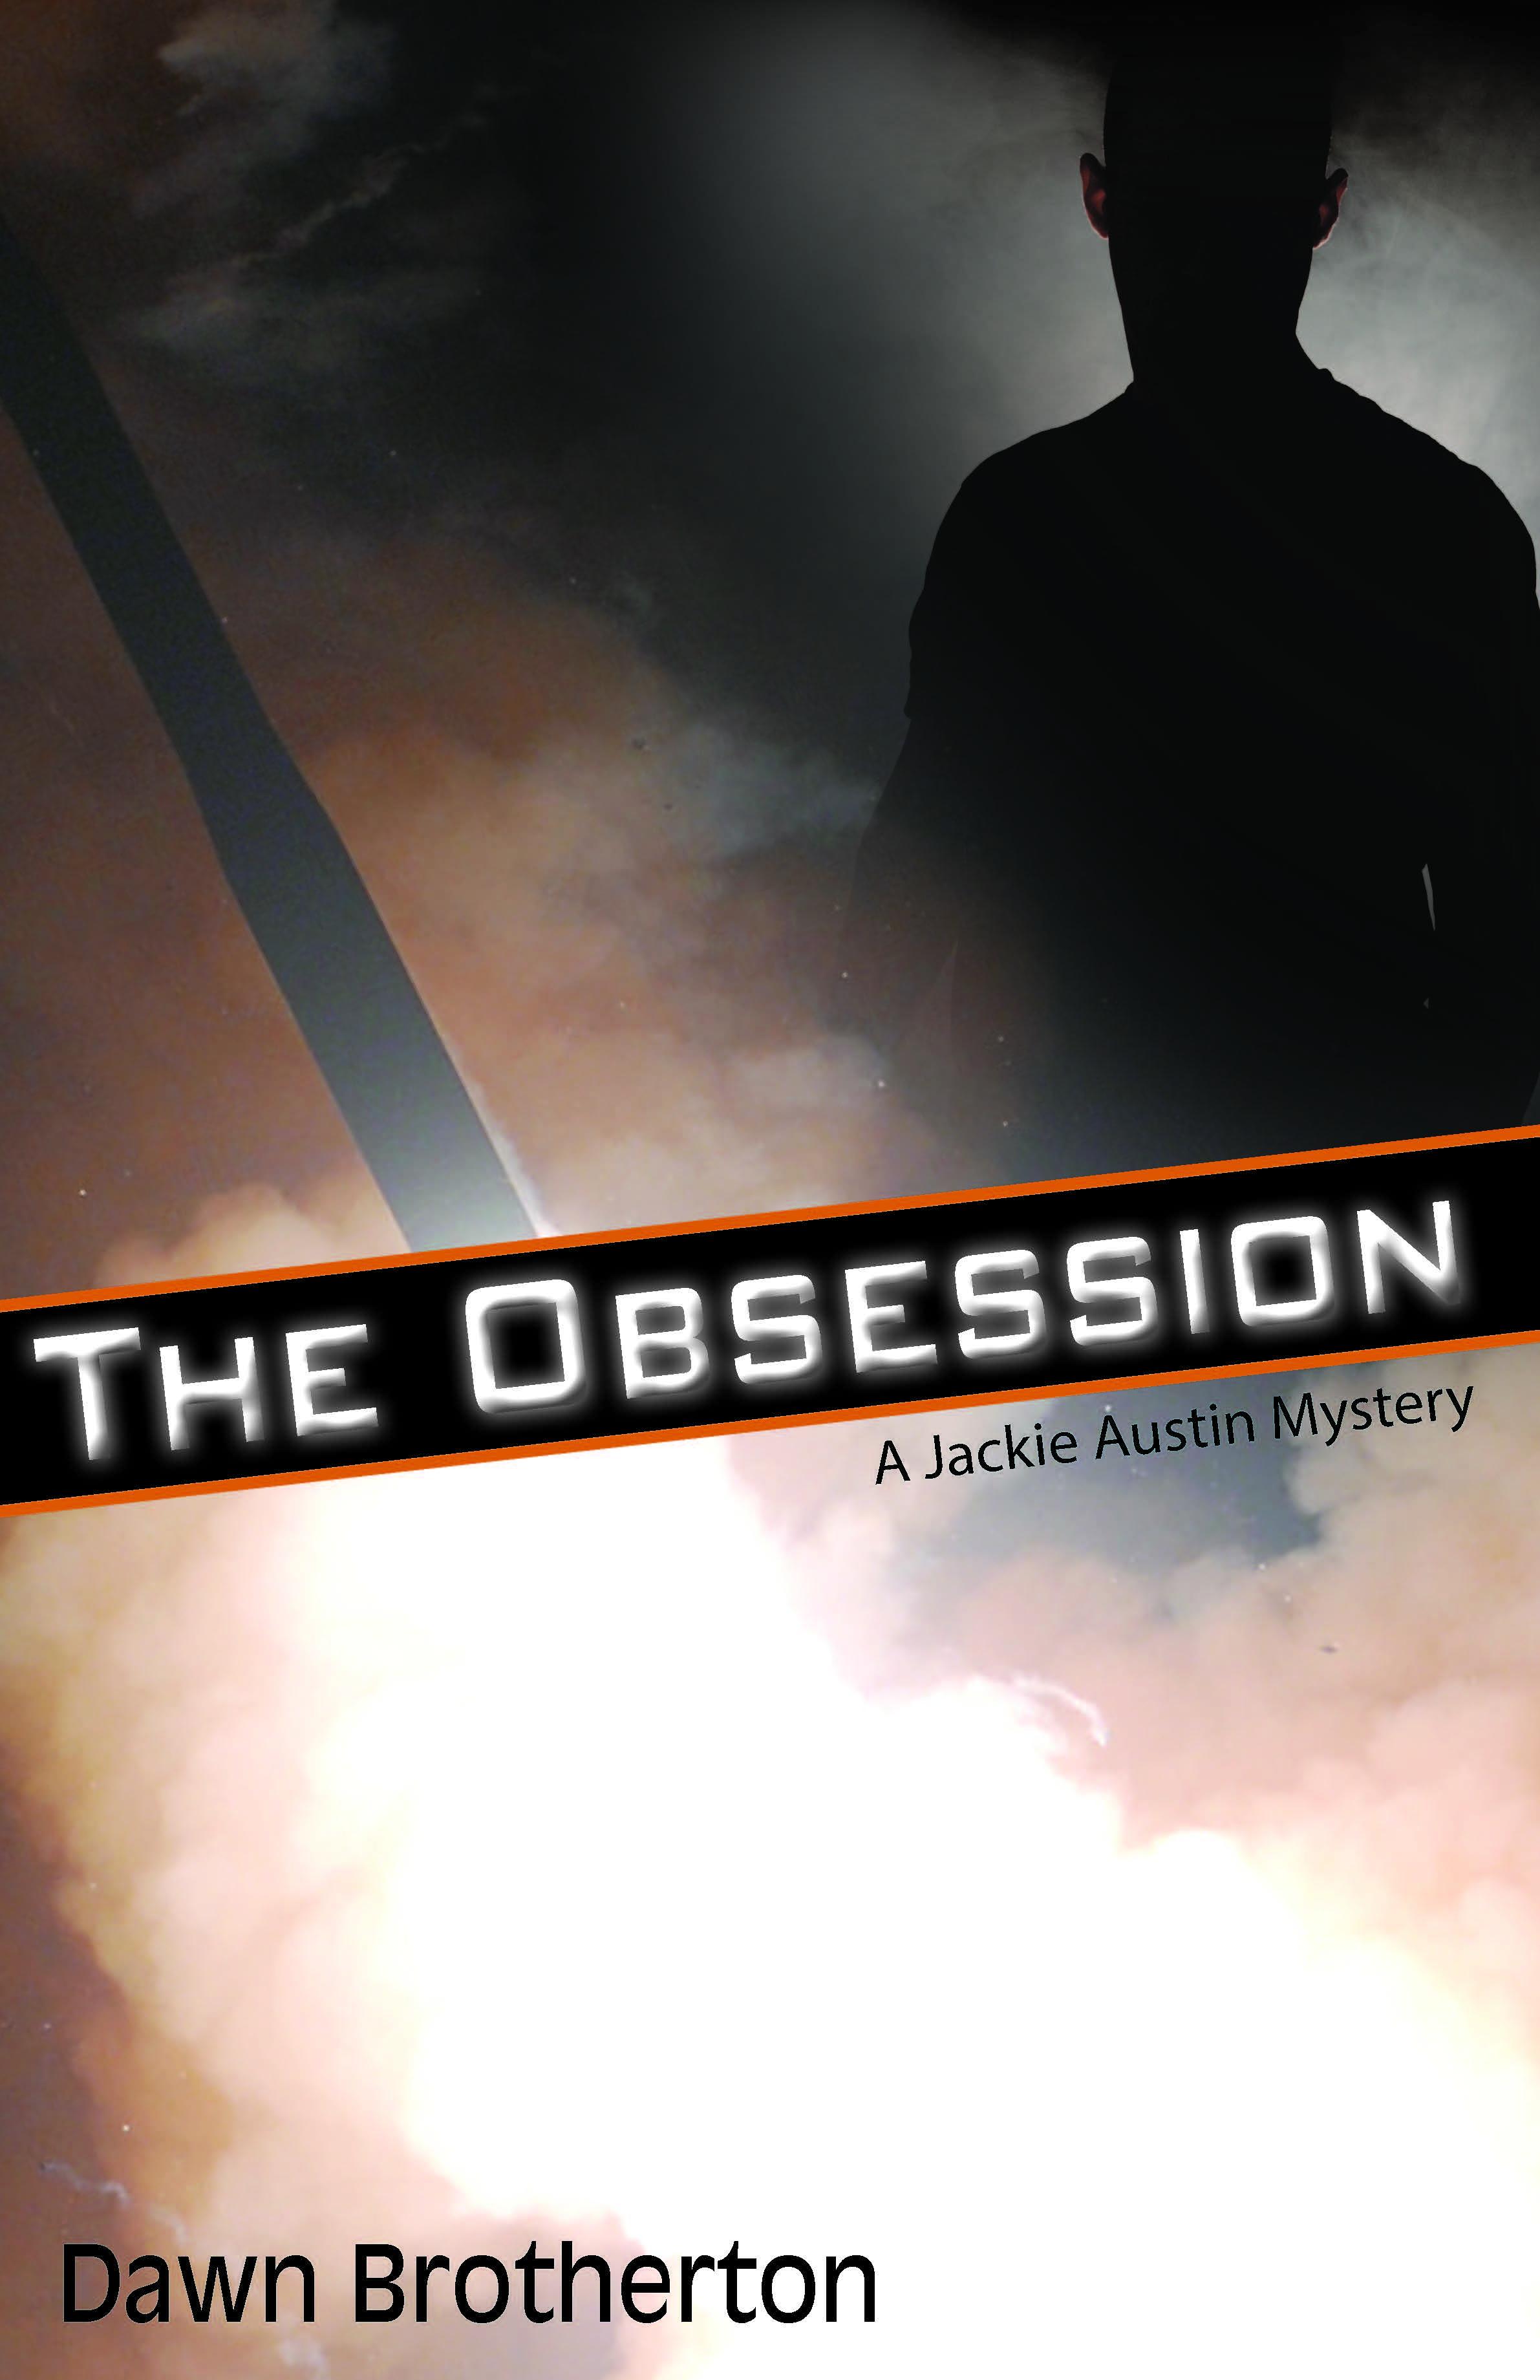 obsession, Brotherton, austin, mystery, stalker, murder, military, missile